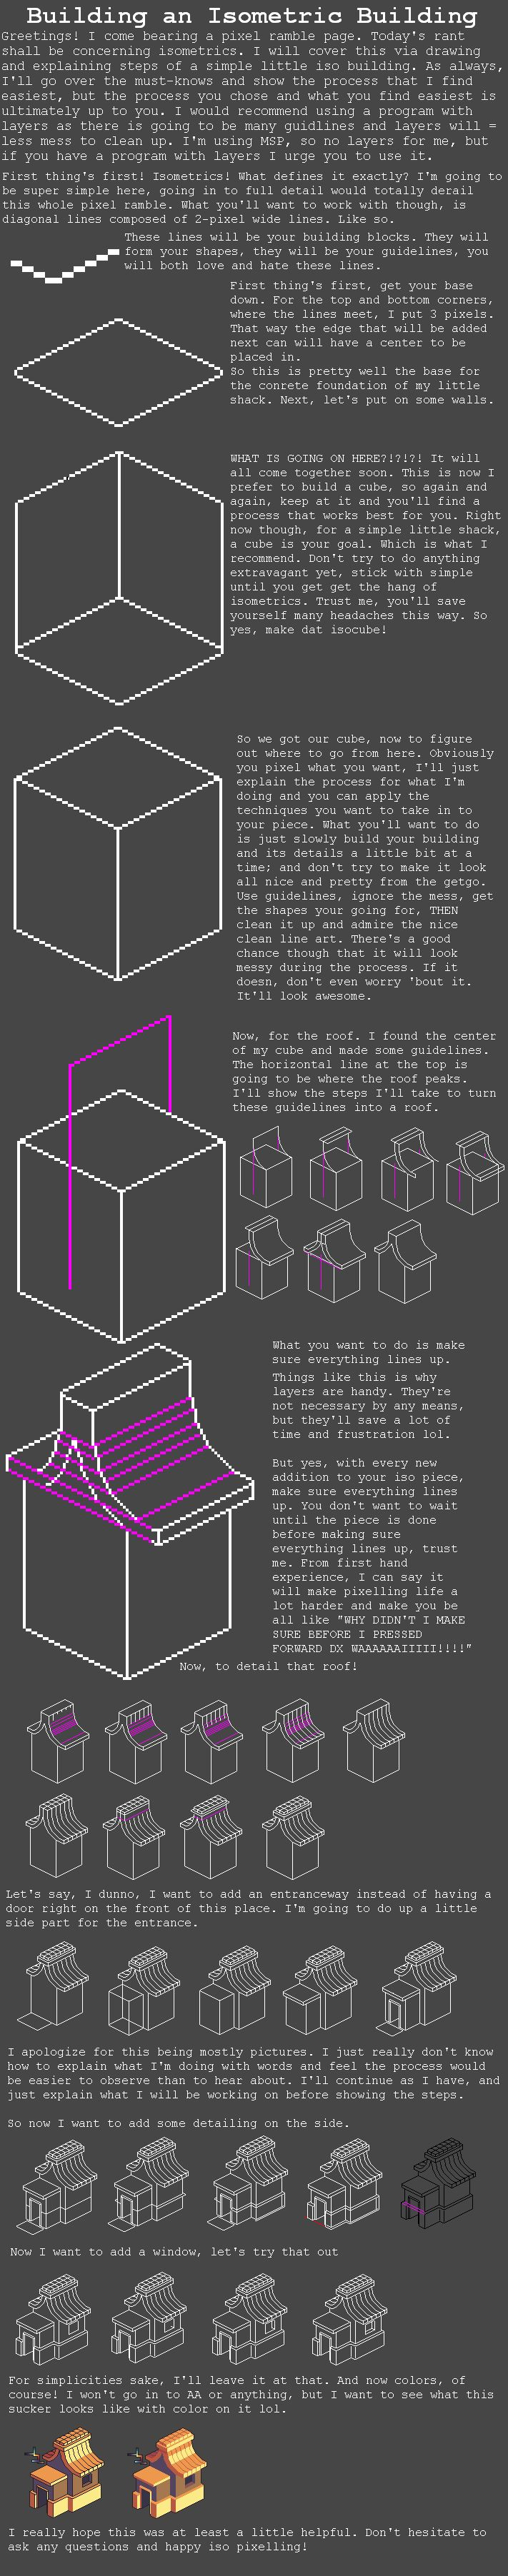 Isometric Tutorial by RHLPixels on DeviantArt